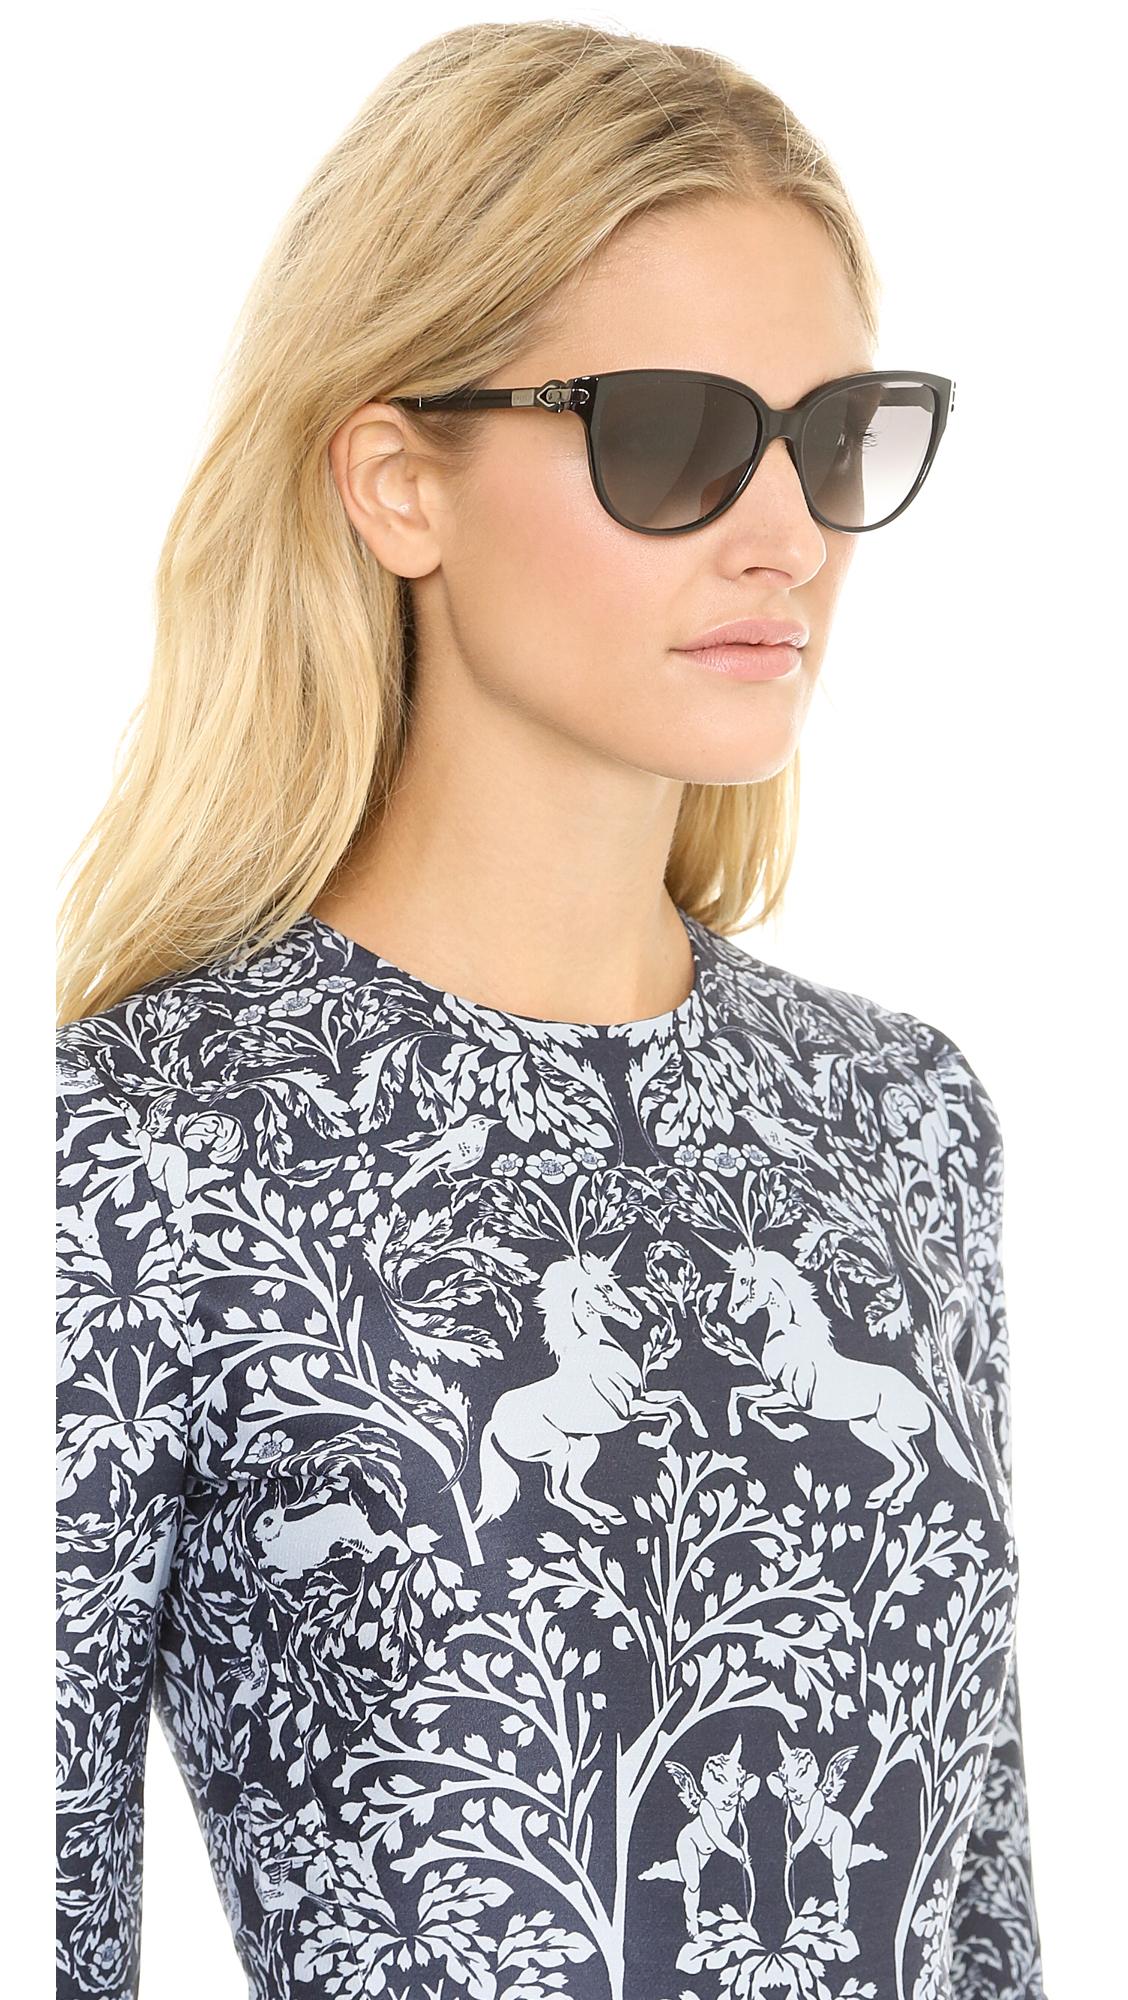 491162c413076 Givenchy Cat Eye Sunglasses - Black Smoke in Black - Lyst